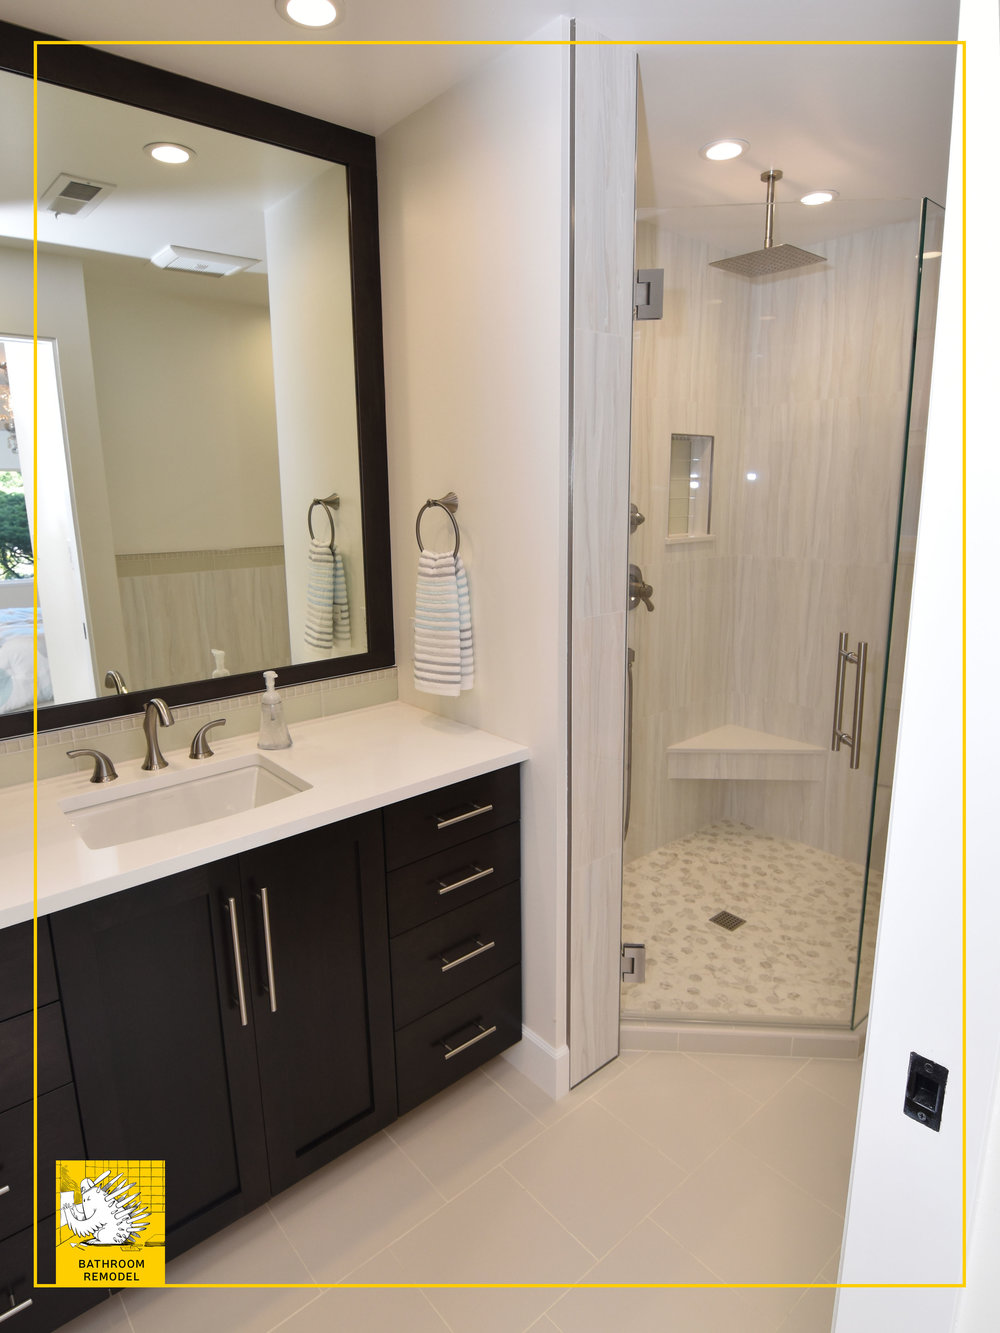 MT bathroom 6 after 1.jpg